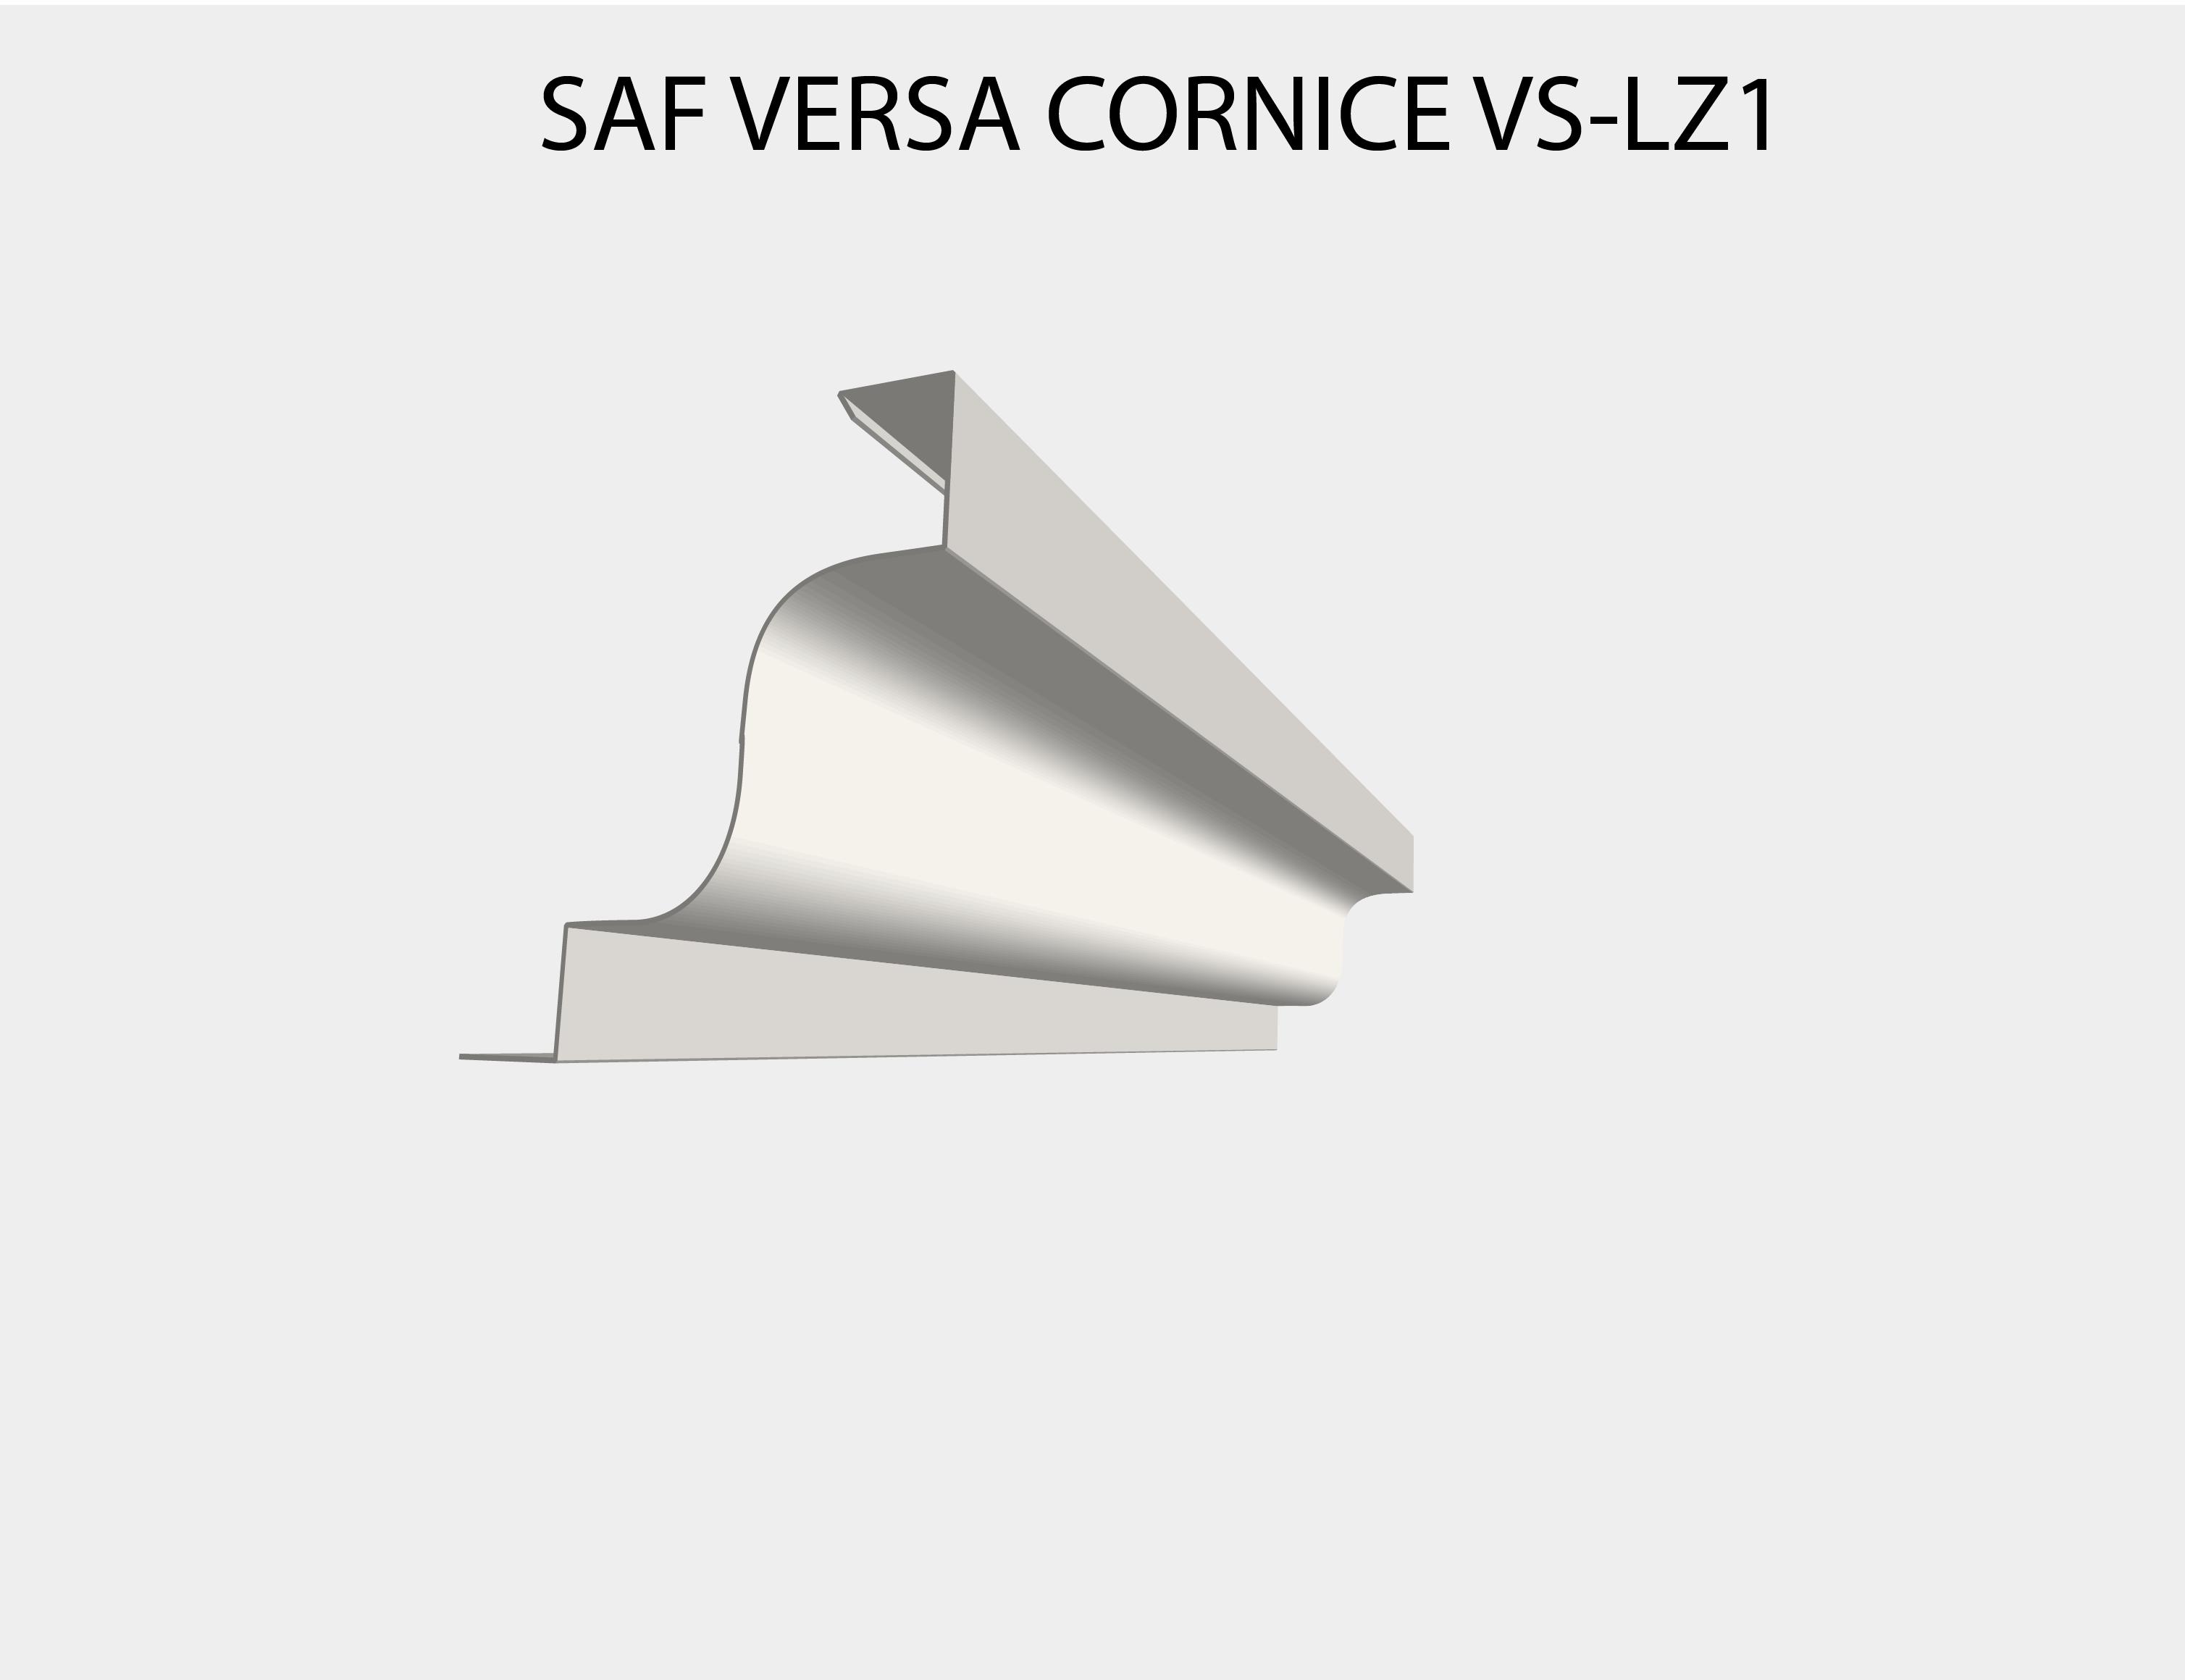 Formed Aluminum Cornices - SAF - Southern Aluminum Finishing Co, Inc